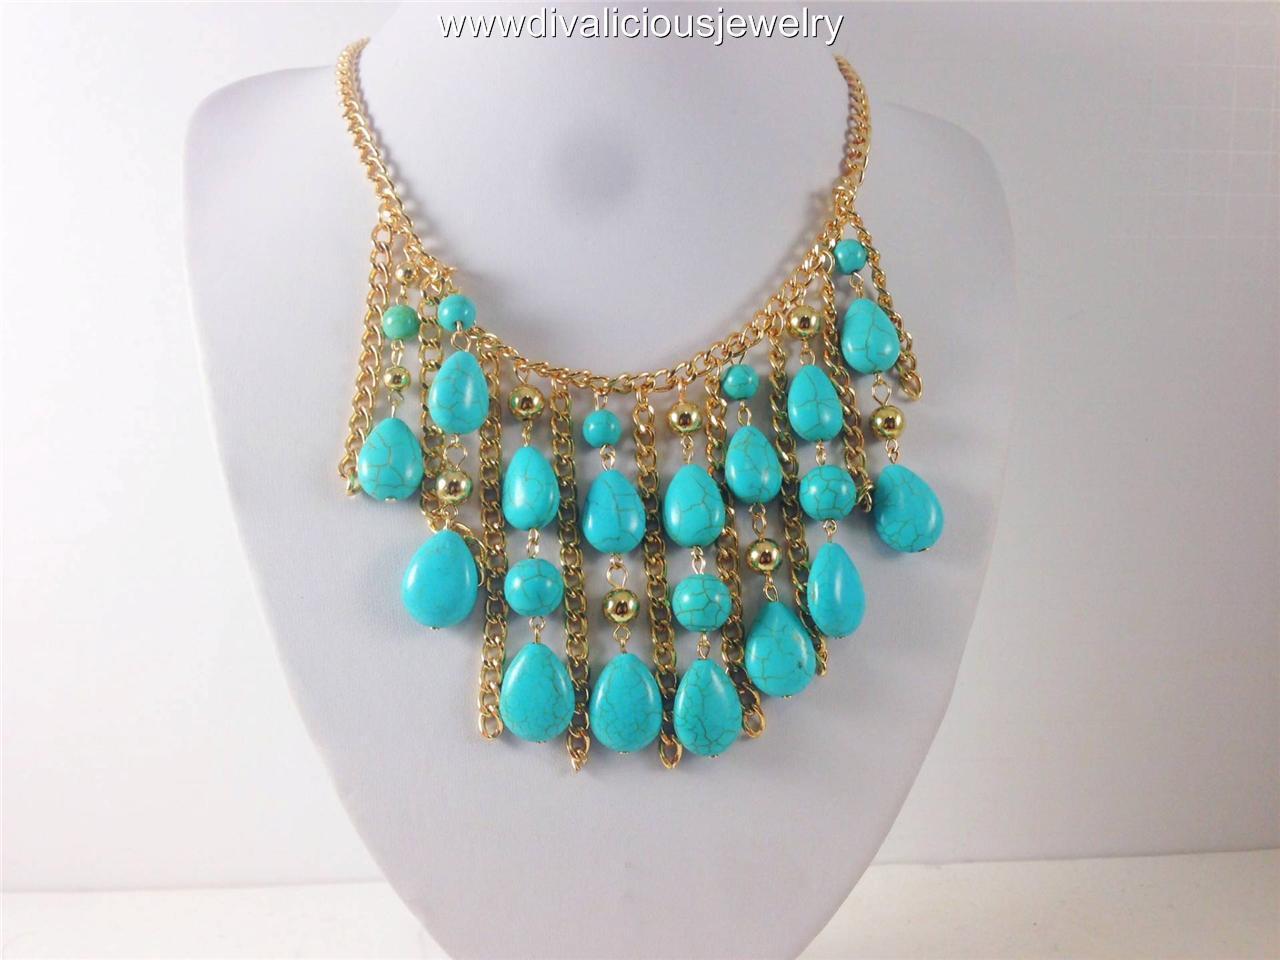 Imperial Multi Stone Diva Necklace Set - Cream or Turqouoise